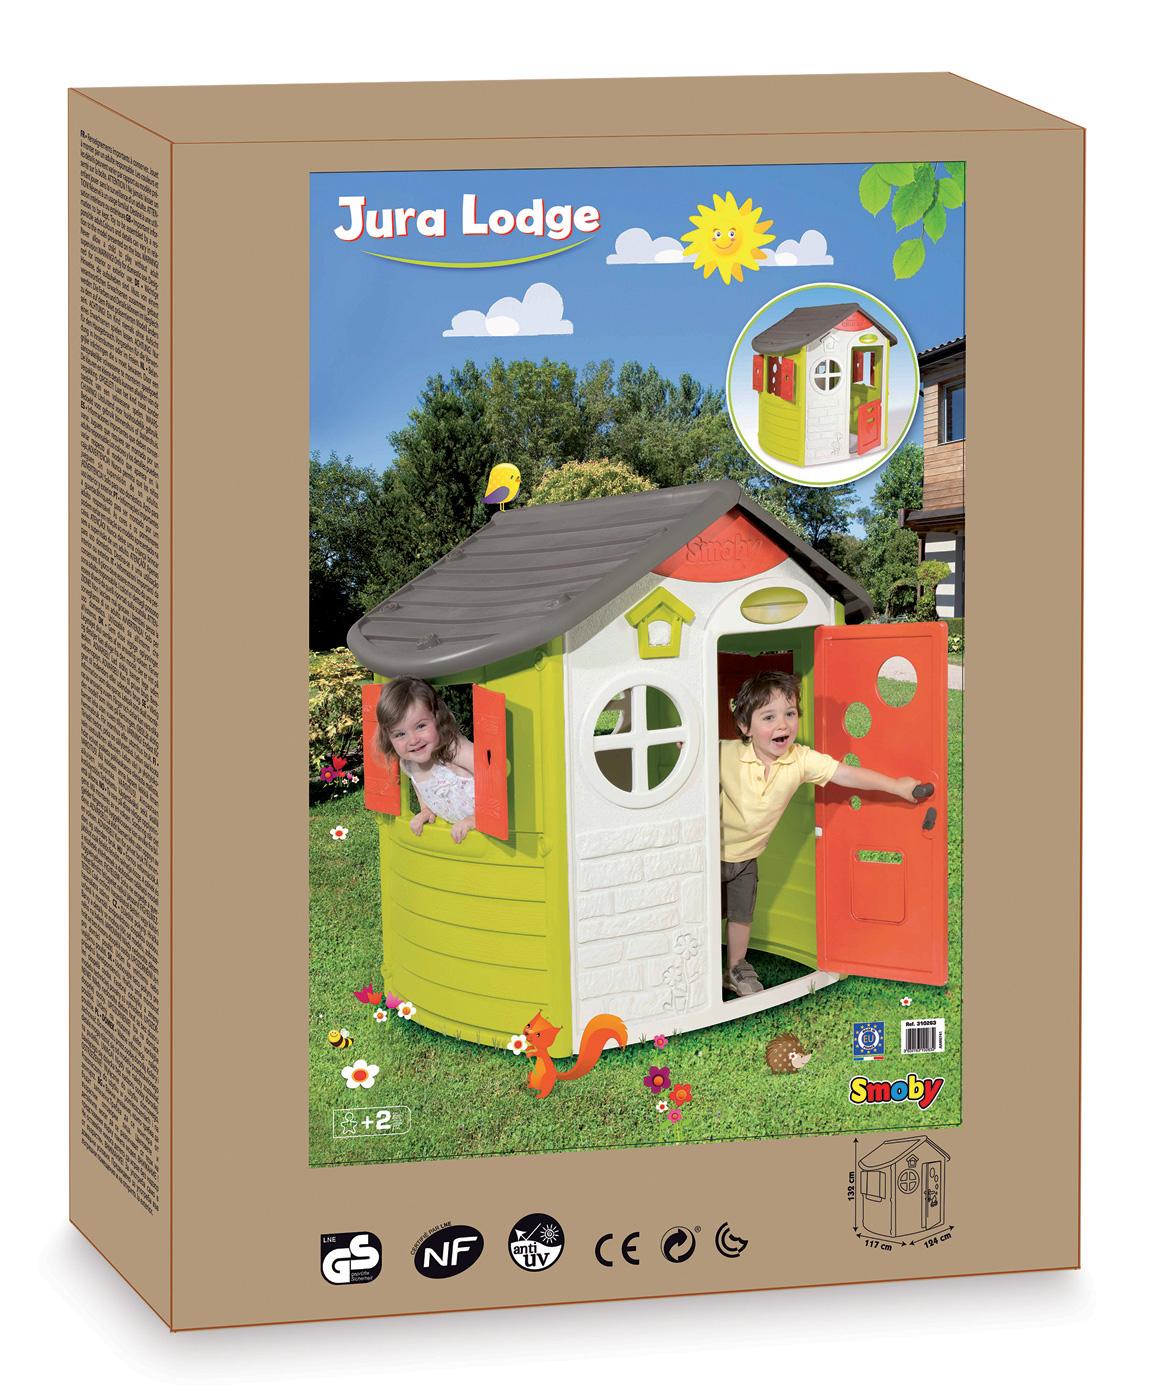 smoby dom ek jura lodge s dverami a okenicami 310263 smoby hra ky. Black Bedroom Furniture Sets. Home Design Ideas